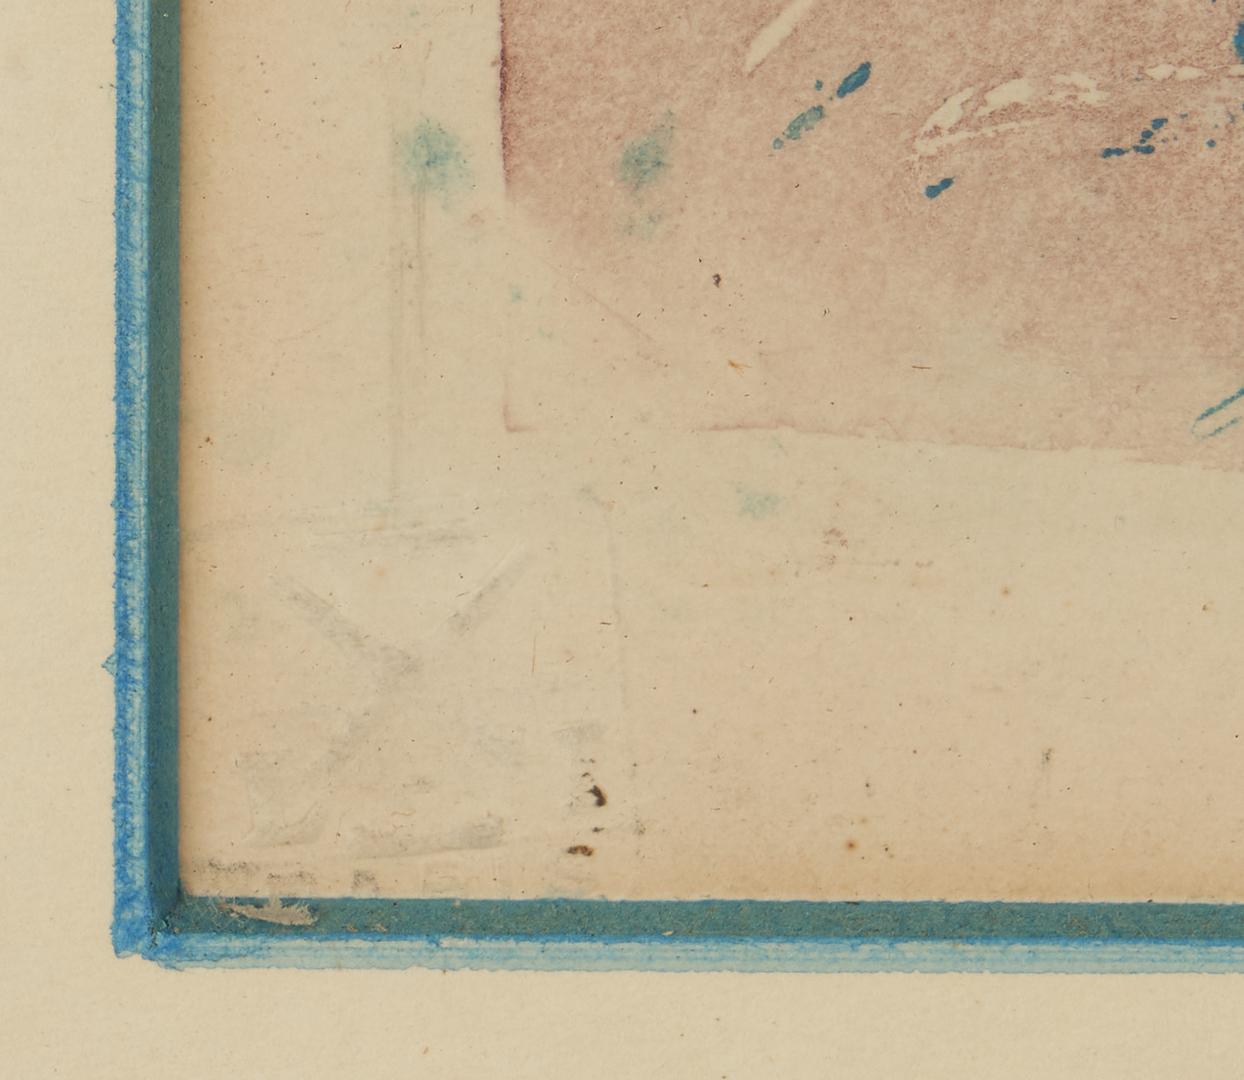 Lot 516: 2 Louis Icart Signed Original Etchings